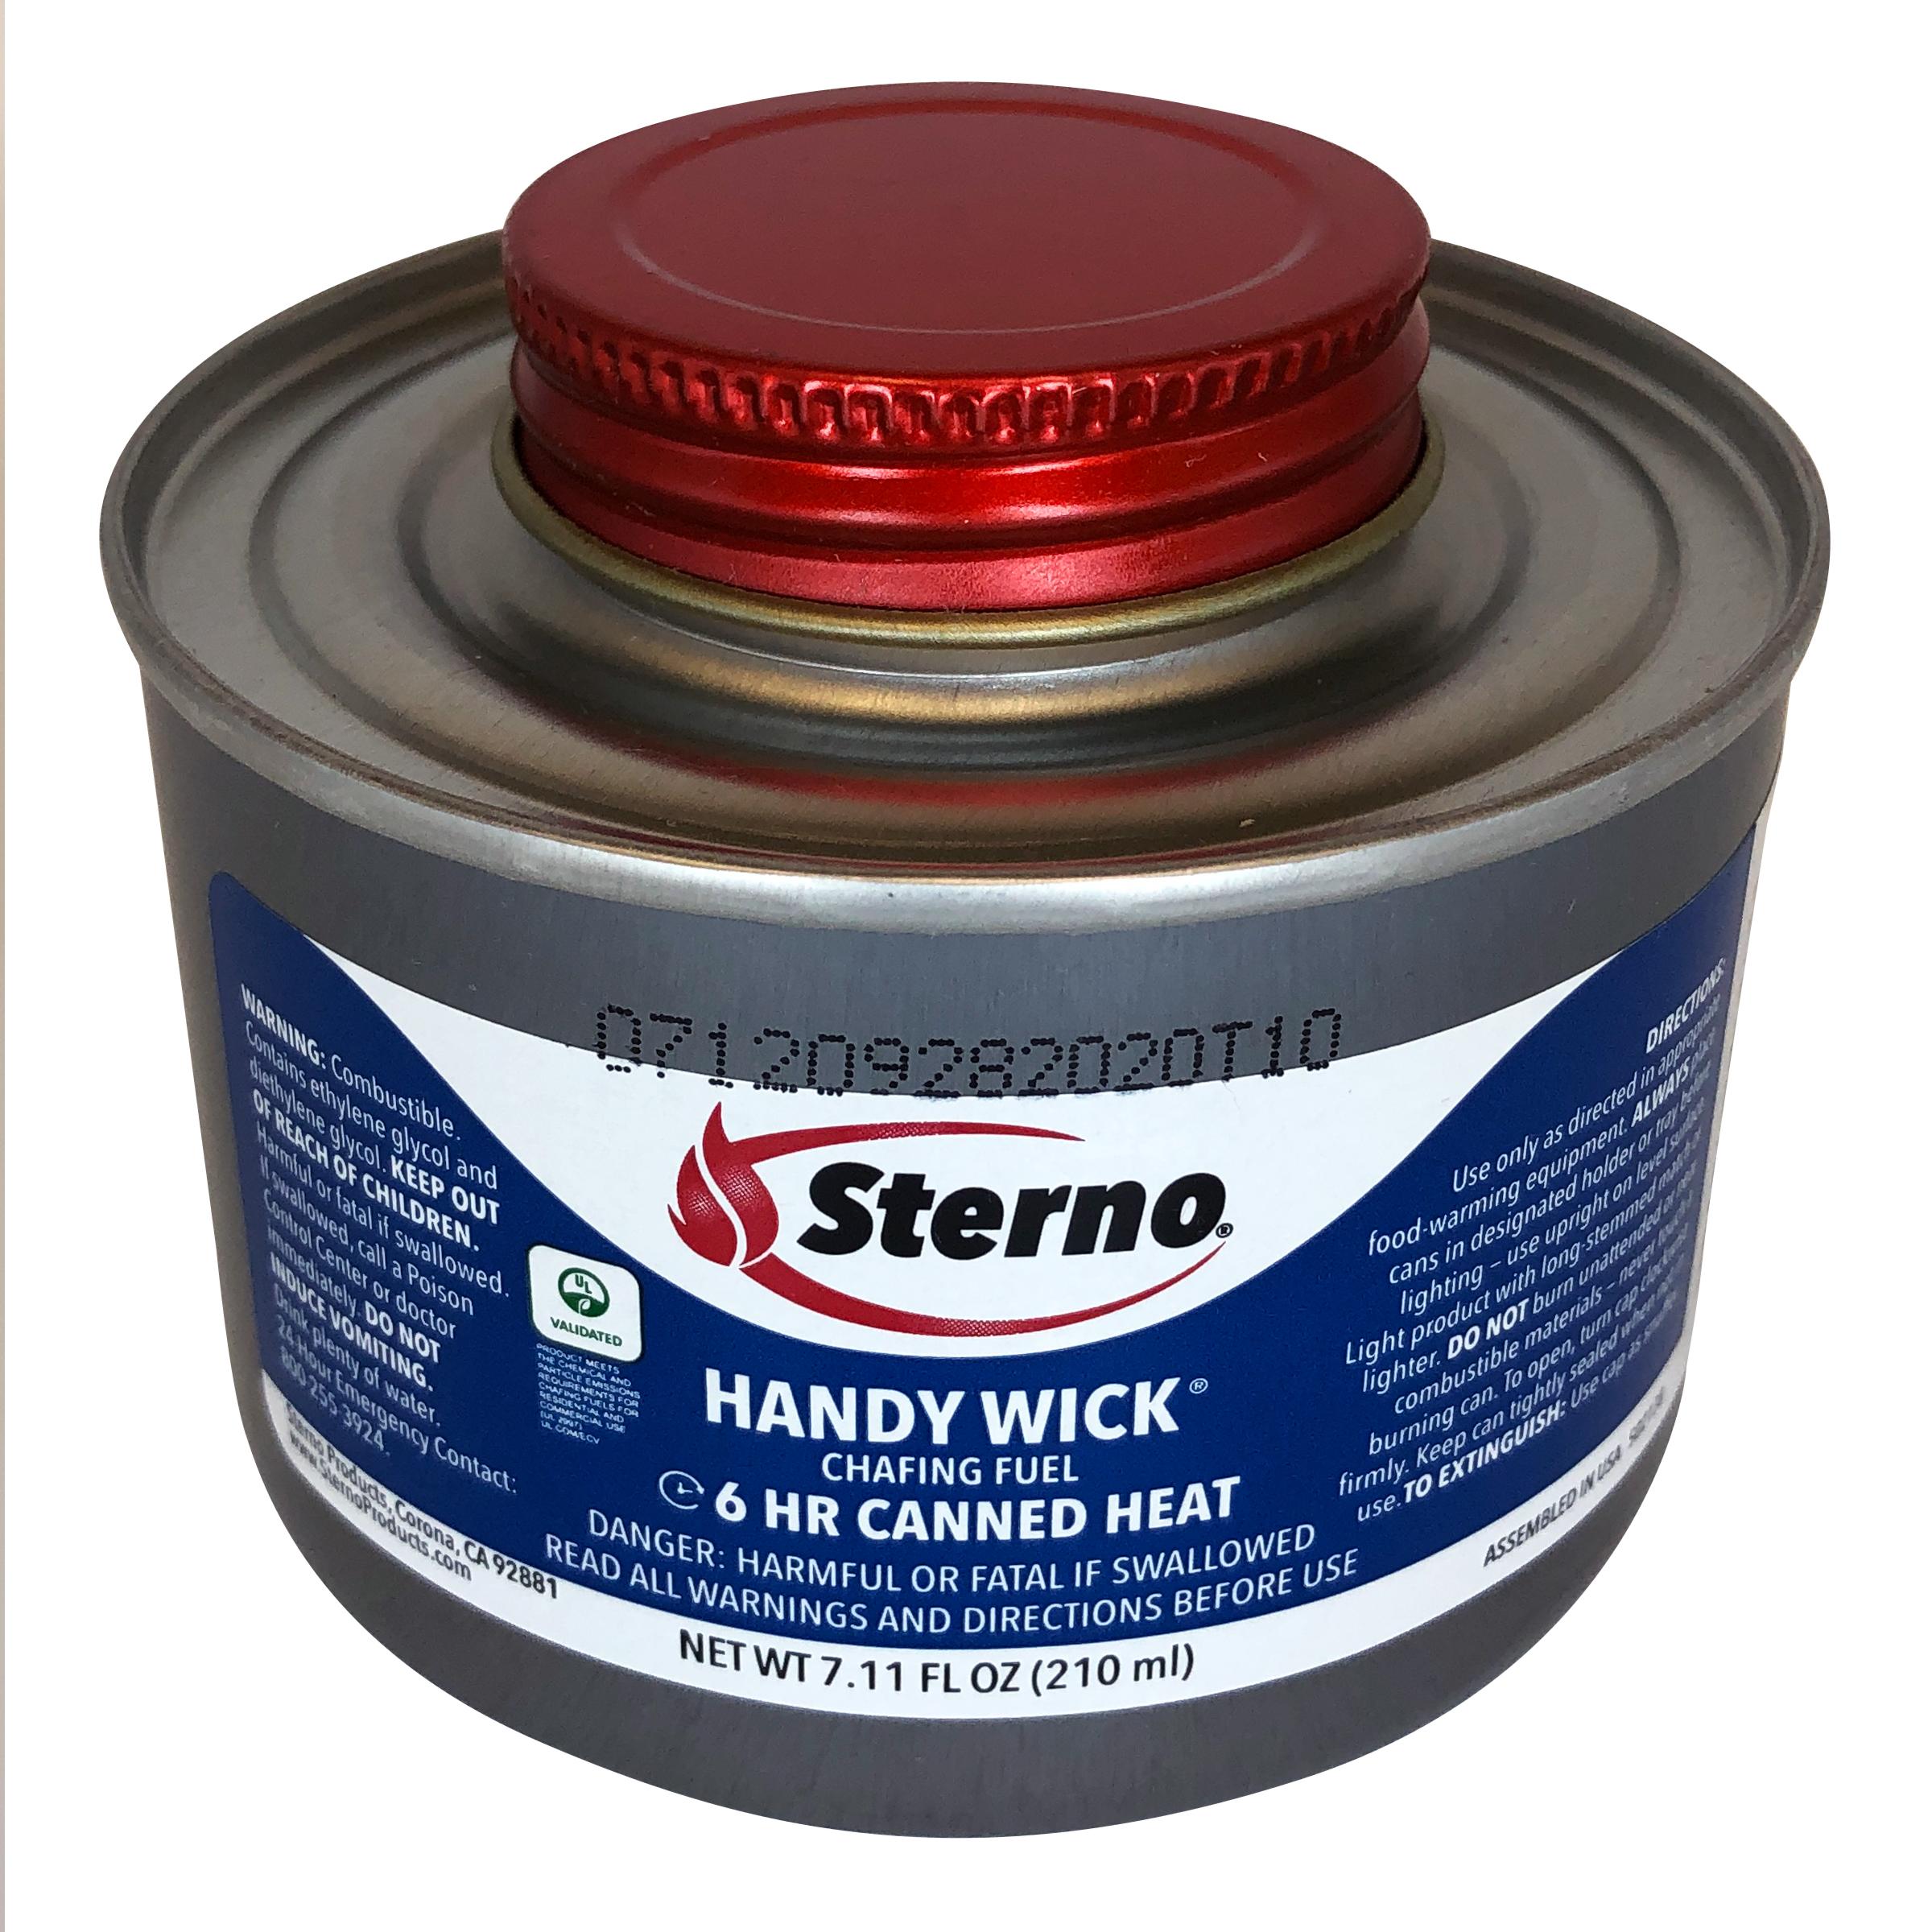 Sterno 10368 wick chafing dish fuel - standard twist